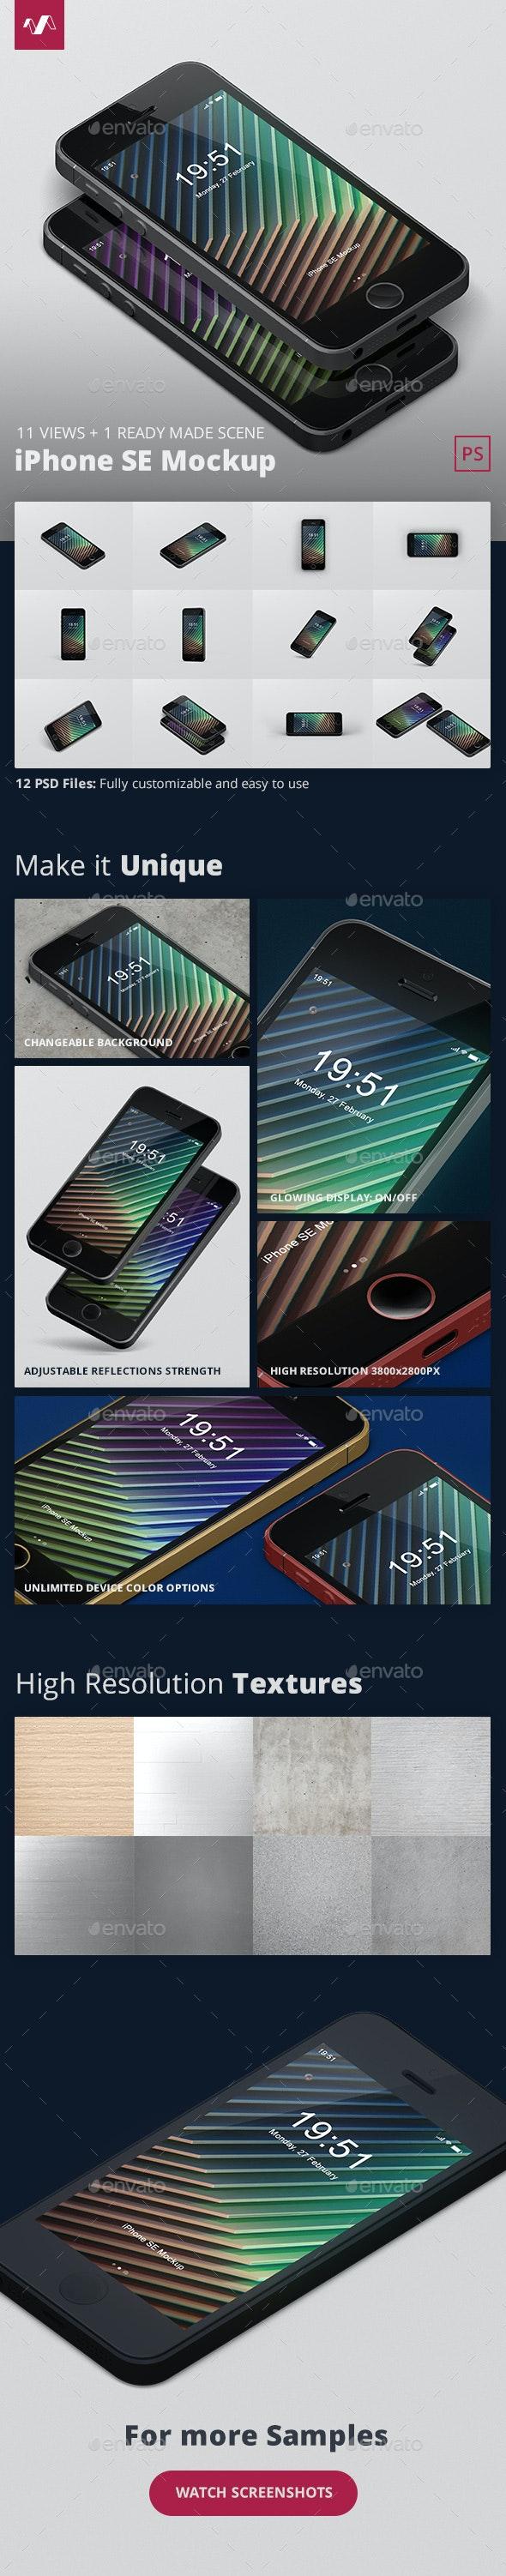 Phone SE Mockup - Mobile Displays